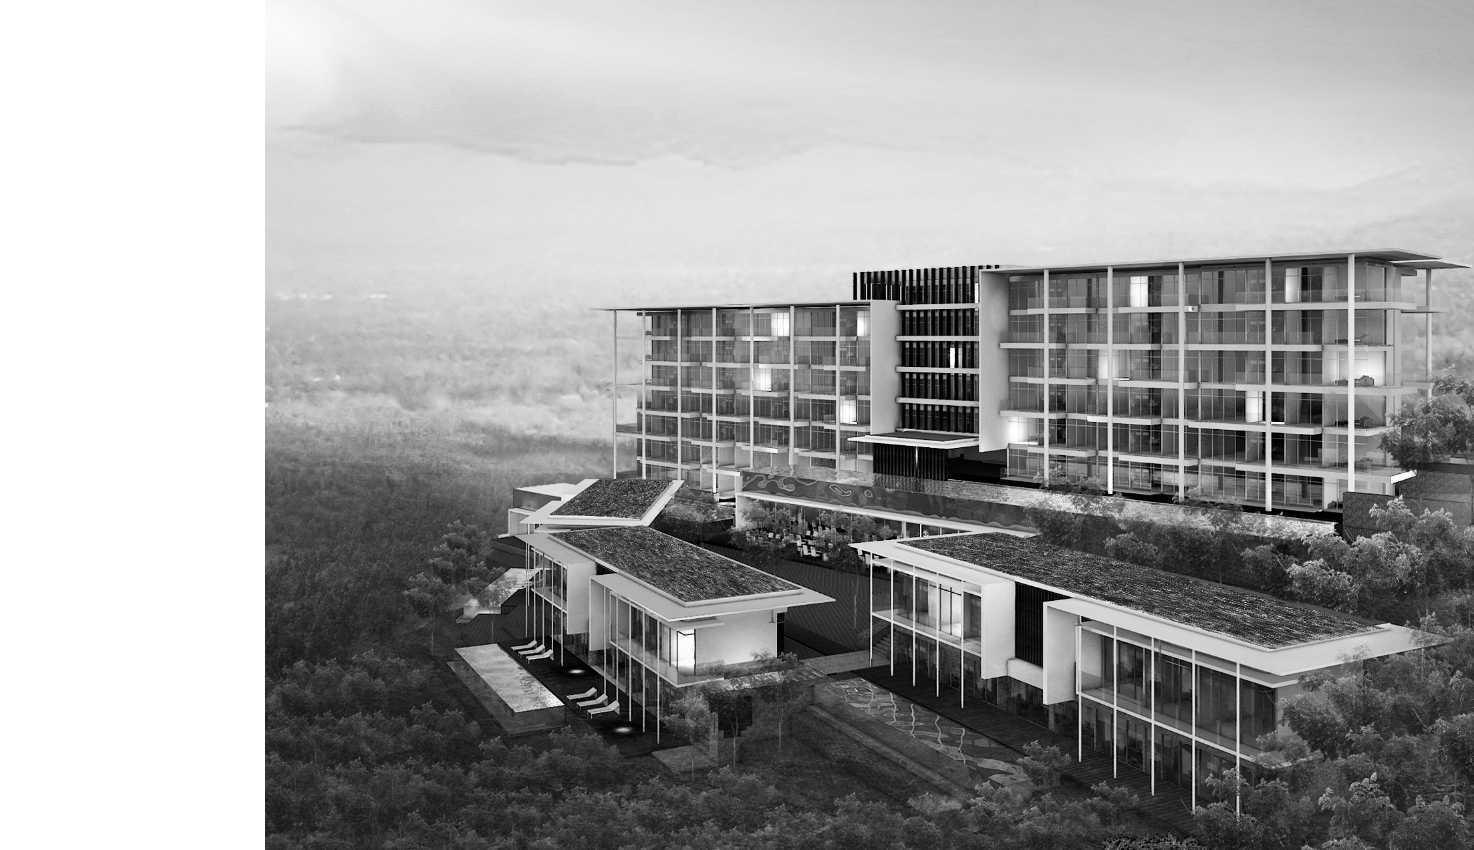 Alien Design Consultant Alien Dc Hotels & Resort Porto Palembang Palembang Aliencompro260Mmx300Mm12Updated051  44720